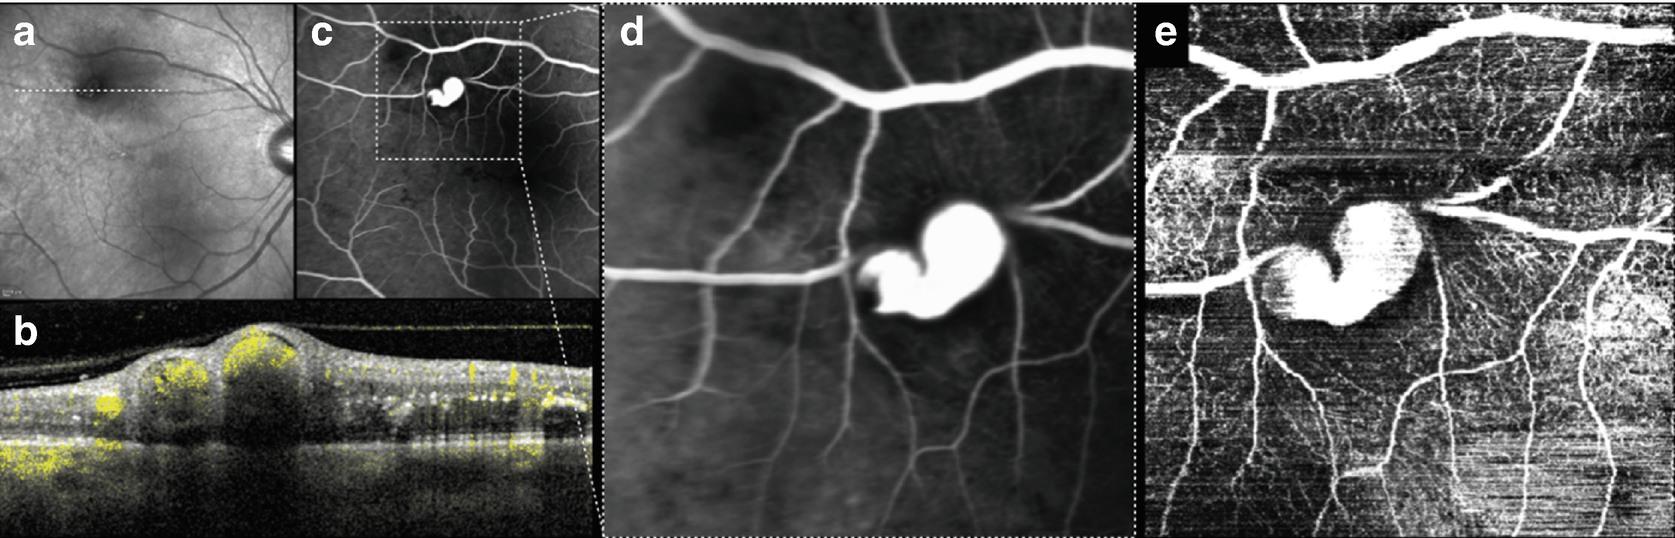 OCT Angiography (OCTA) in Retinal Diagnostics | SpringerLink